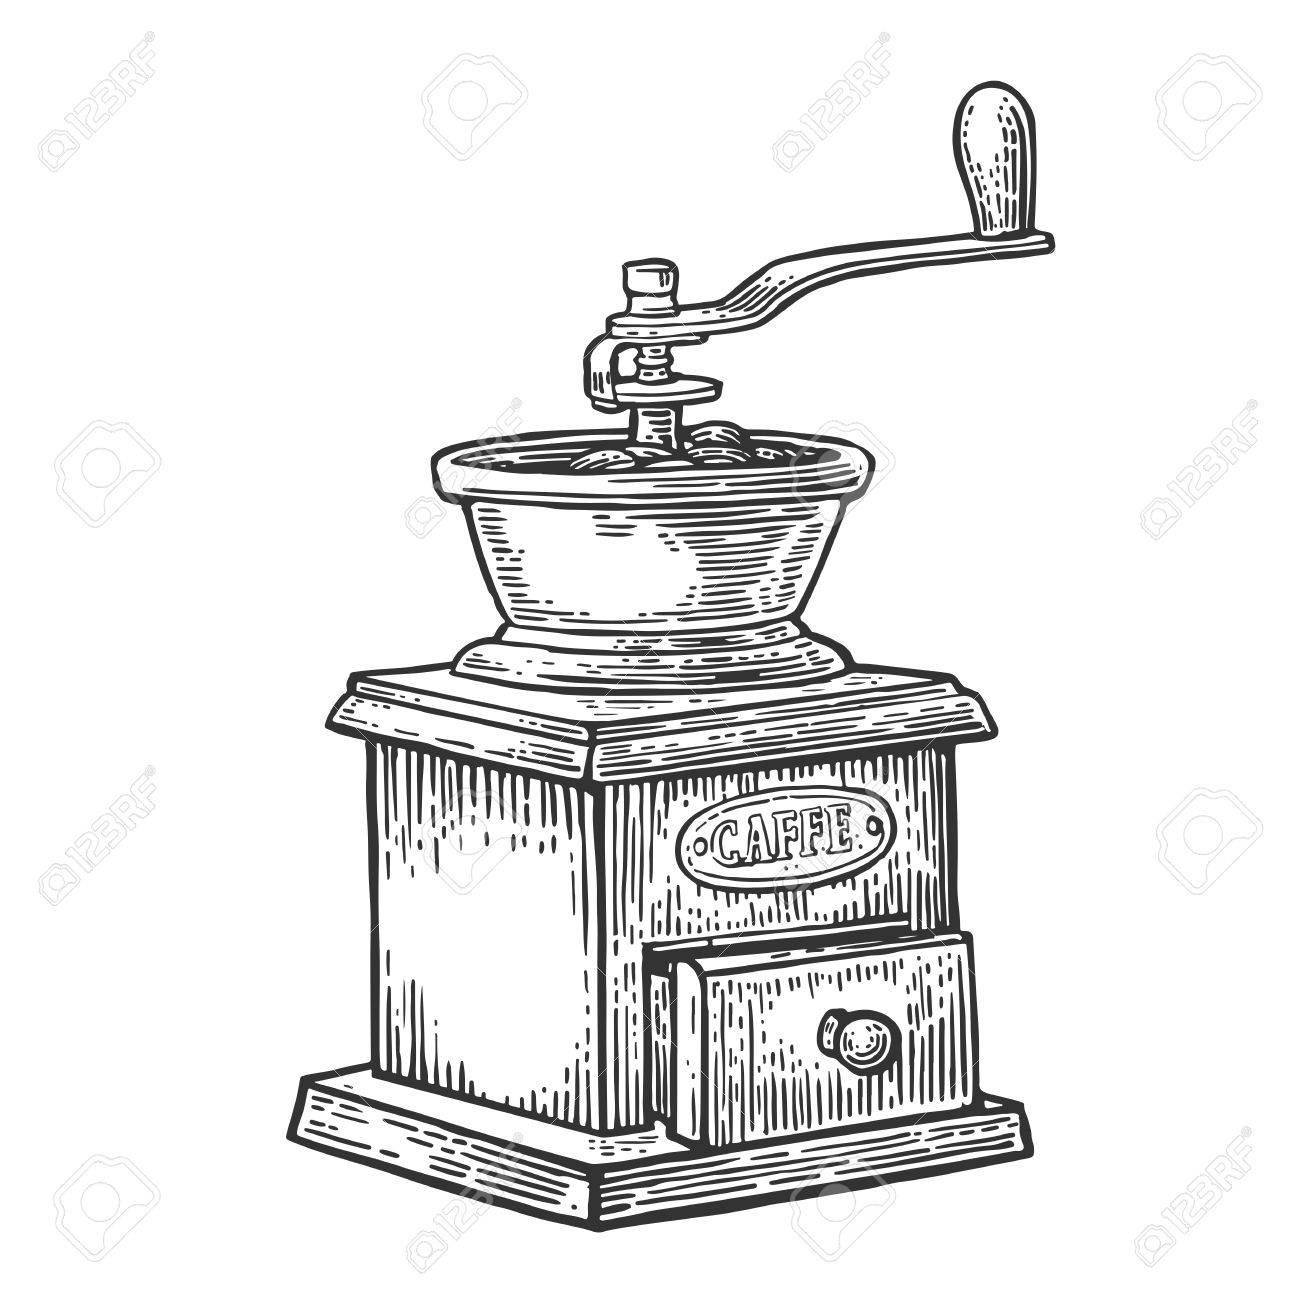 Printable Hand Drawn Antique Coffee Grinder Digital Download Drawing Illustration Image Transfer Clip Art